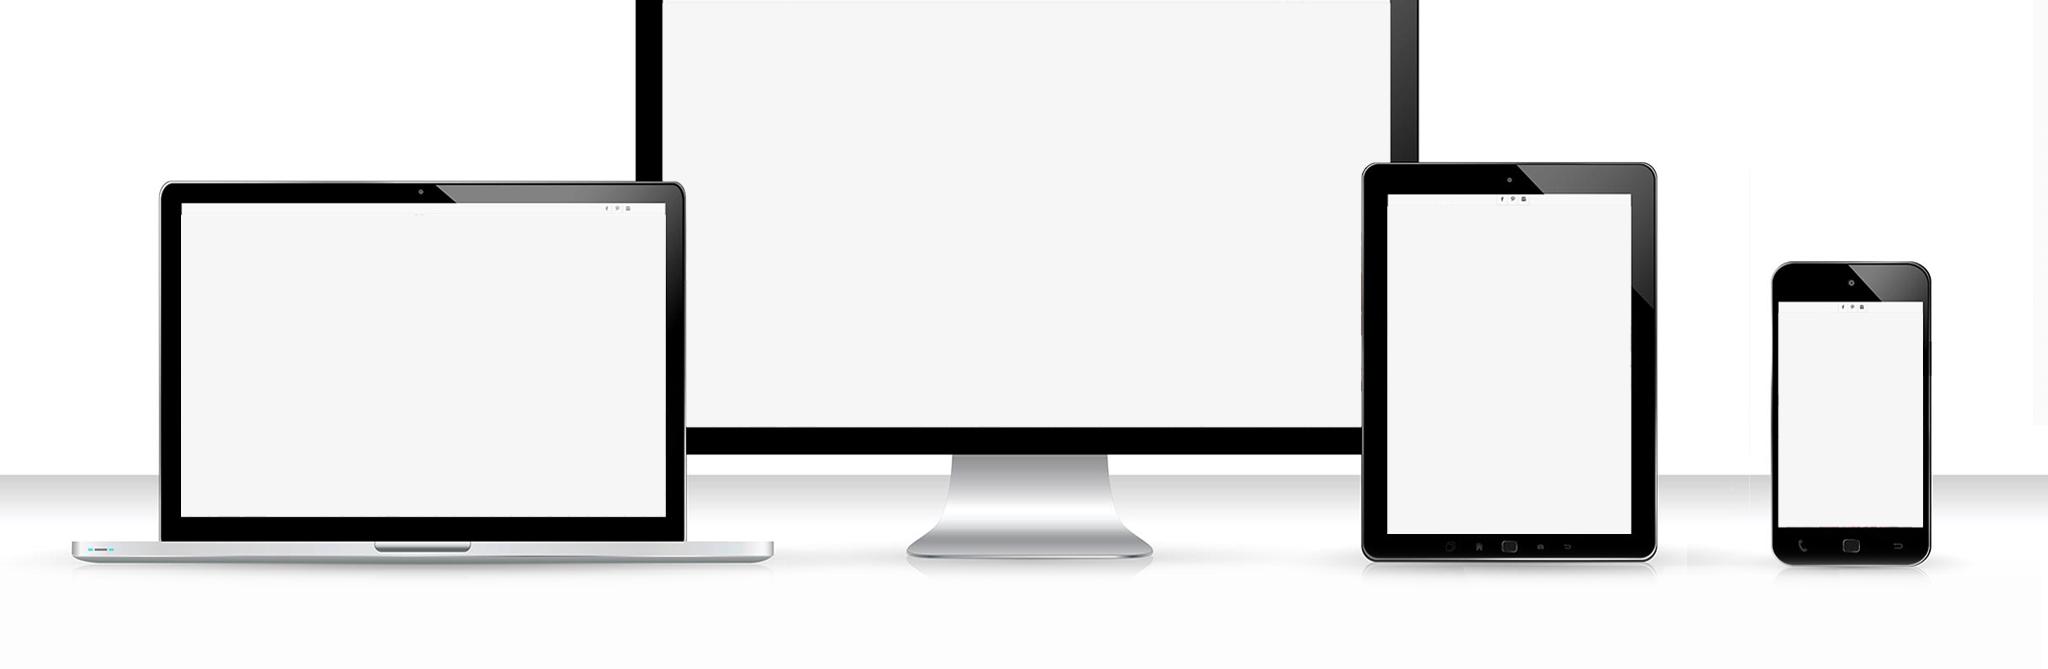 deichnetz crossmedia - Web Design